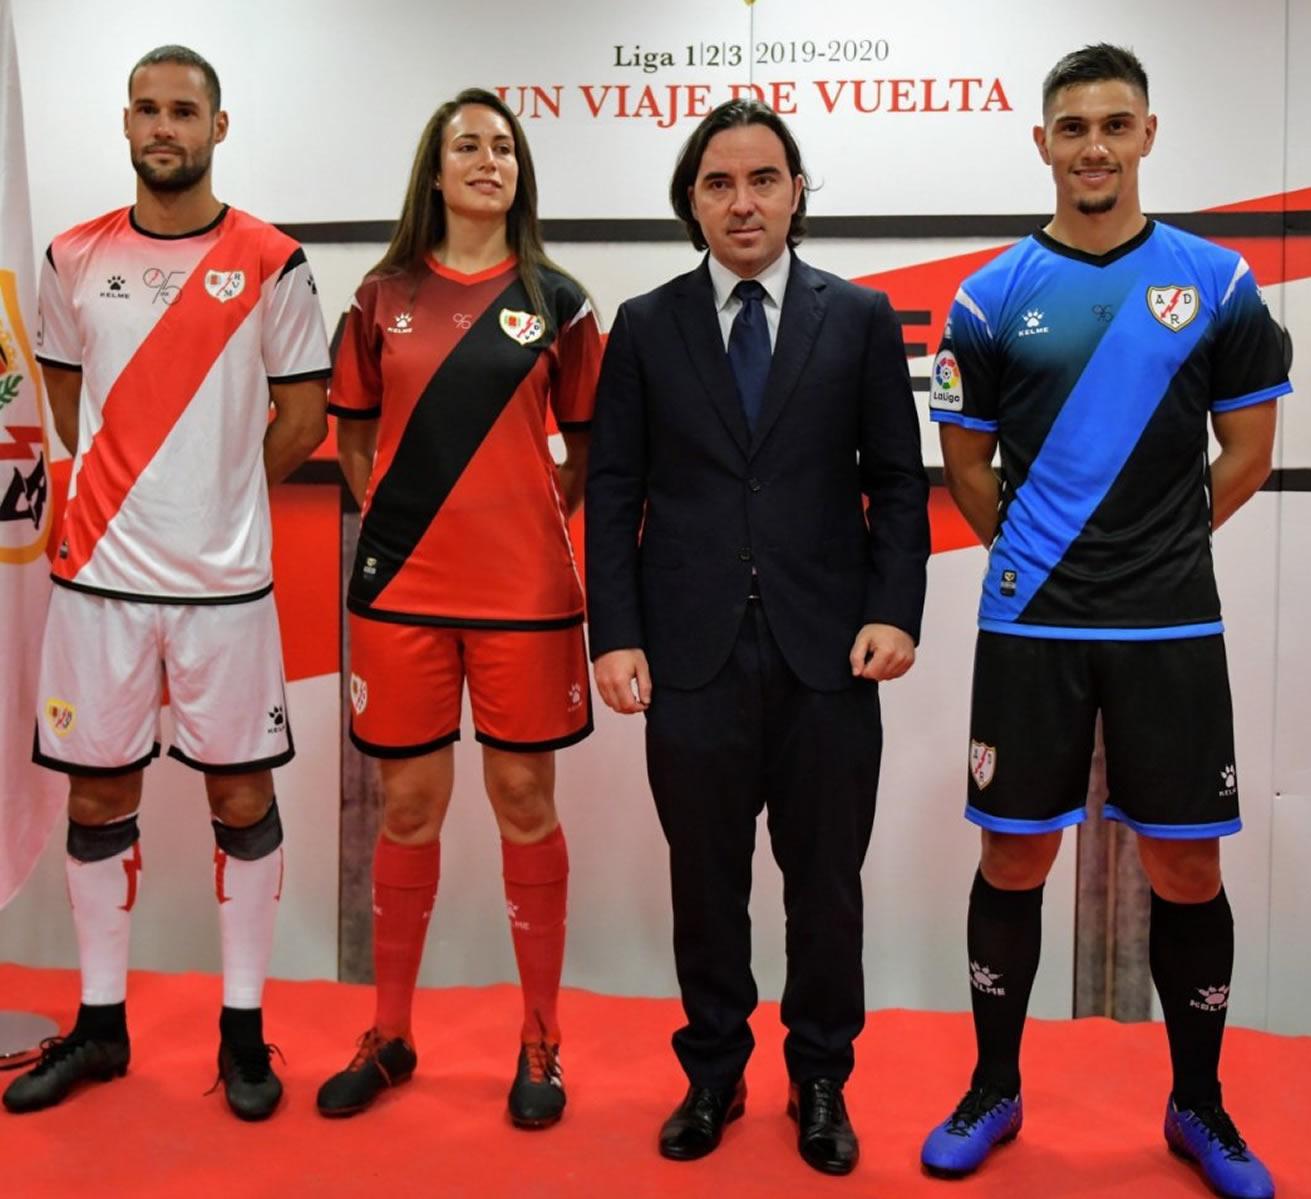 Camisetas Kelme del Rayo Vallecano 2019/20   Imagen Twitter Oficial